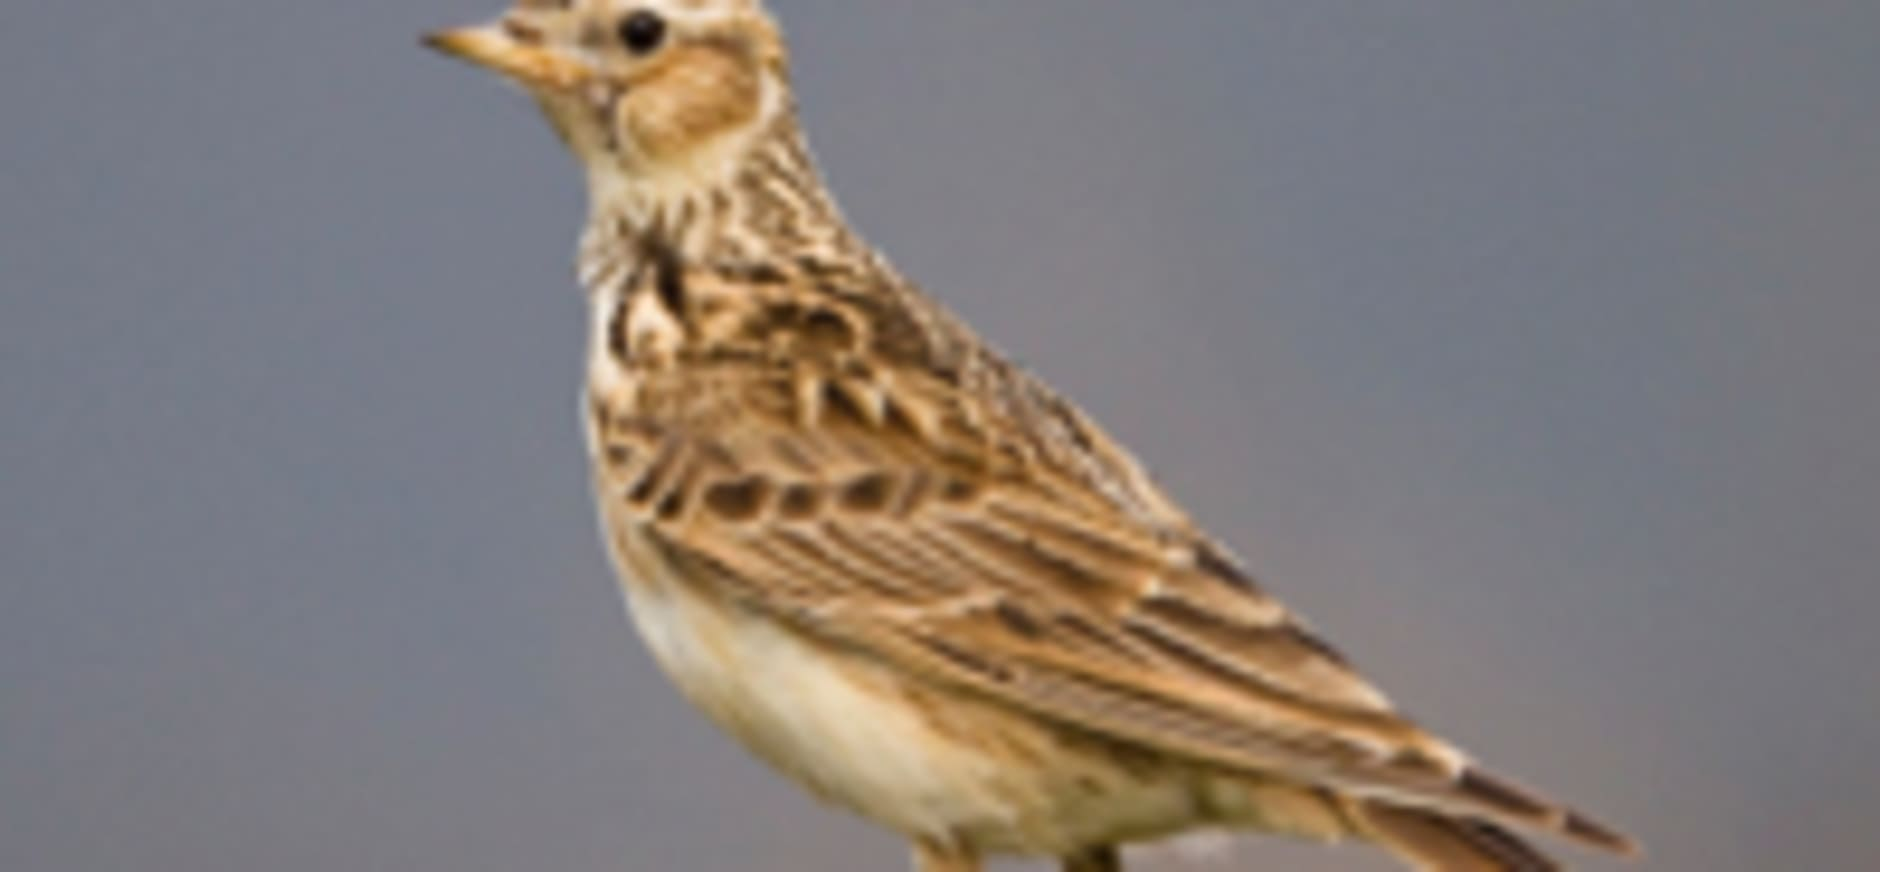 Vogels spotten in de Vughtse Gement